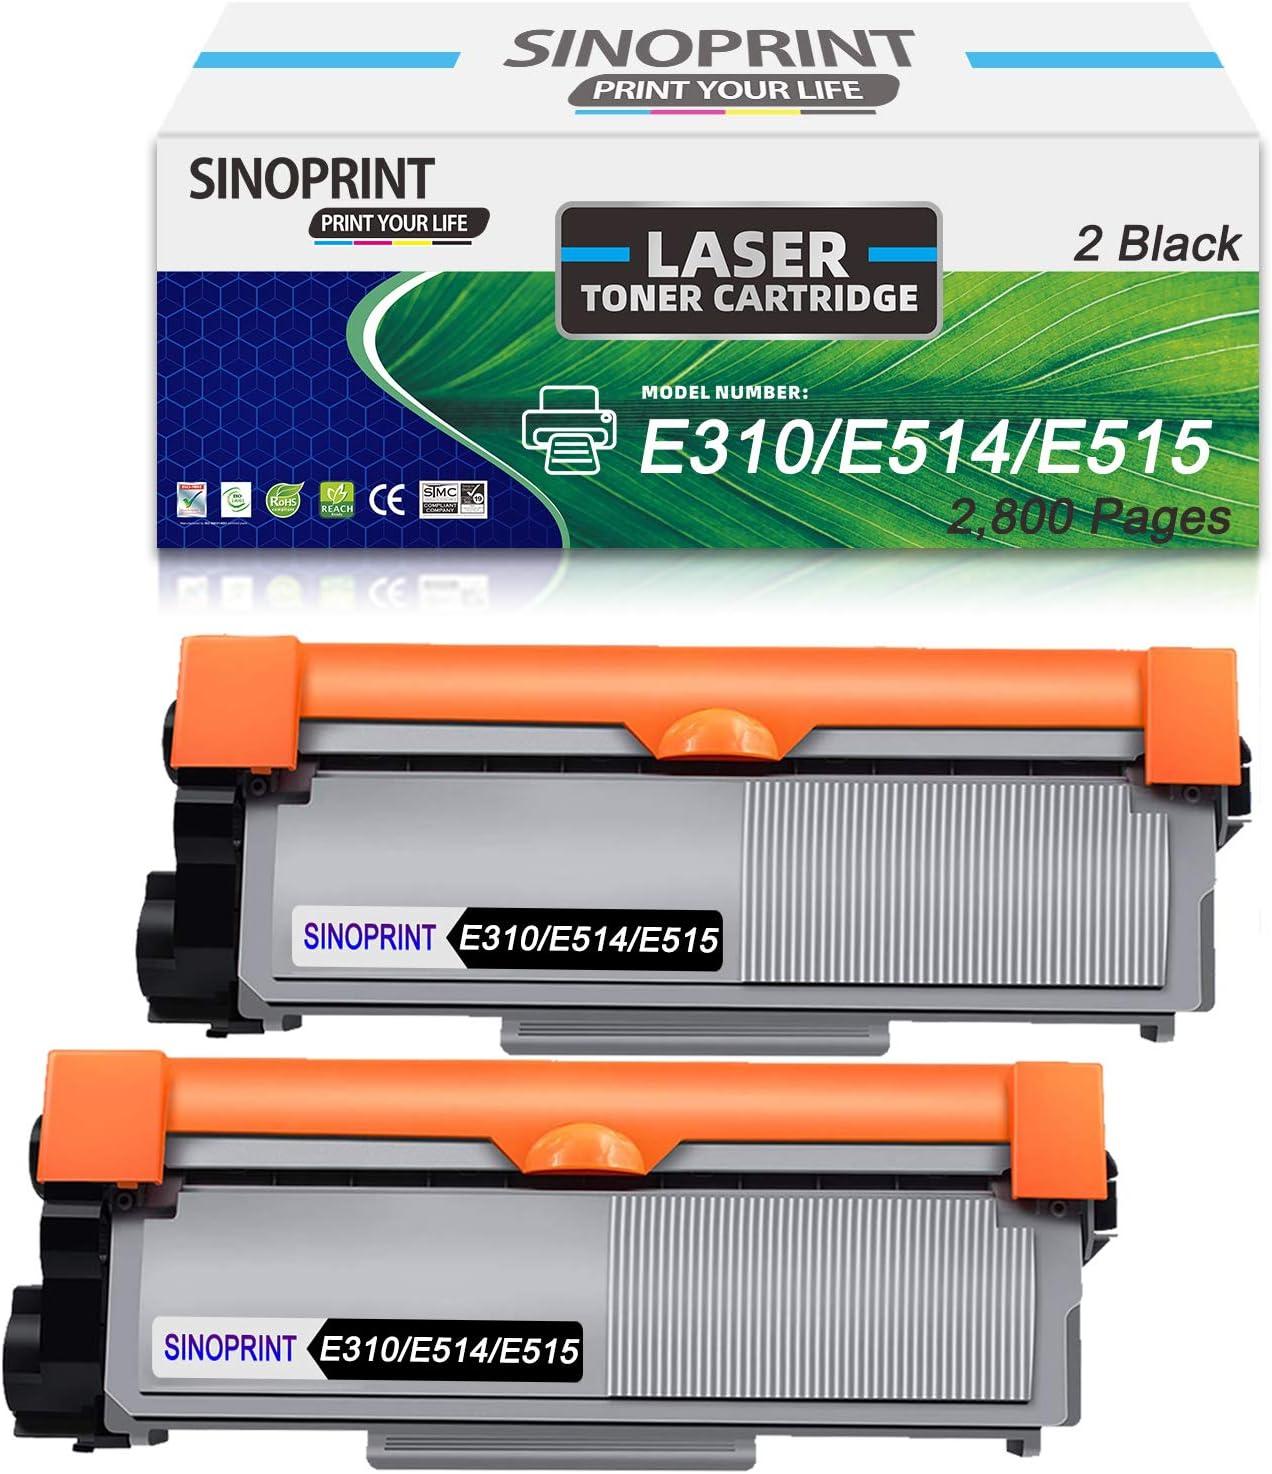 SINOPRINT Compatible E310 Toner Cartridge Replacement for Dell E310 E514 E515 use in Dell E310dw E514dw E515dw E515dn Printer-2 Black 2,600 Pages